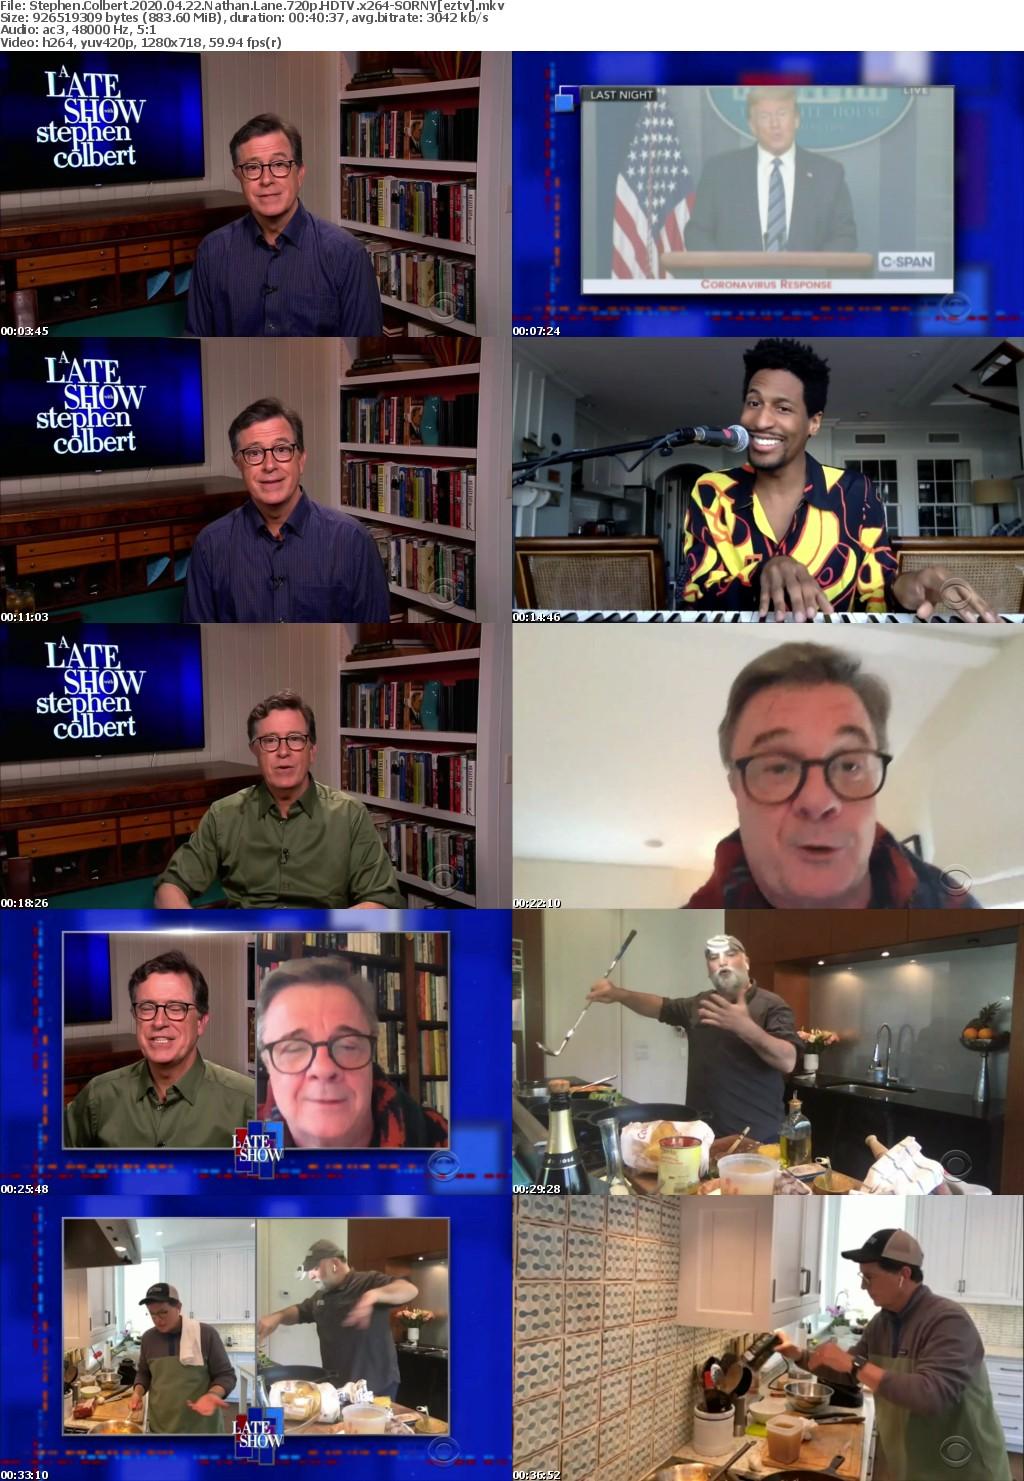 Stephen Colbert 2020 04 22 Nathan Lane 720p HDTV x264-SORNY